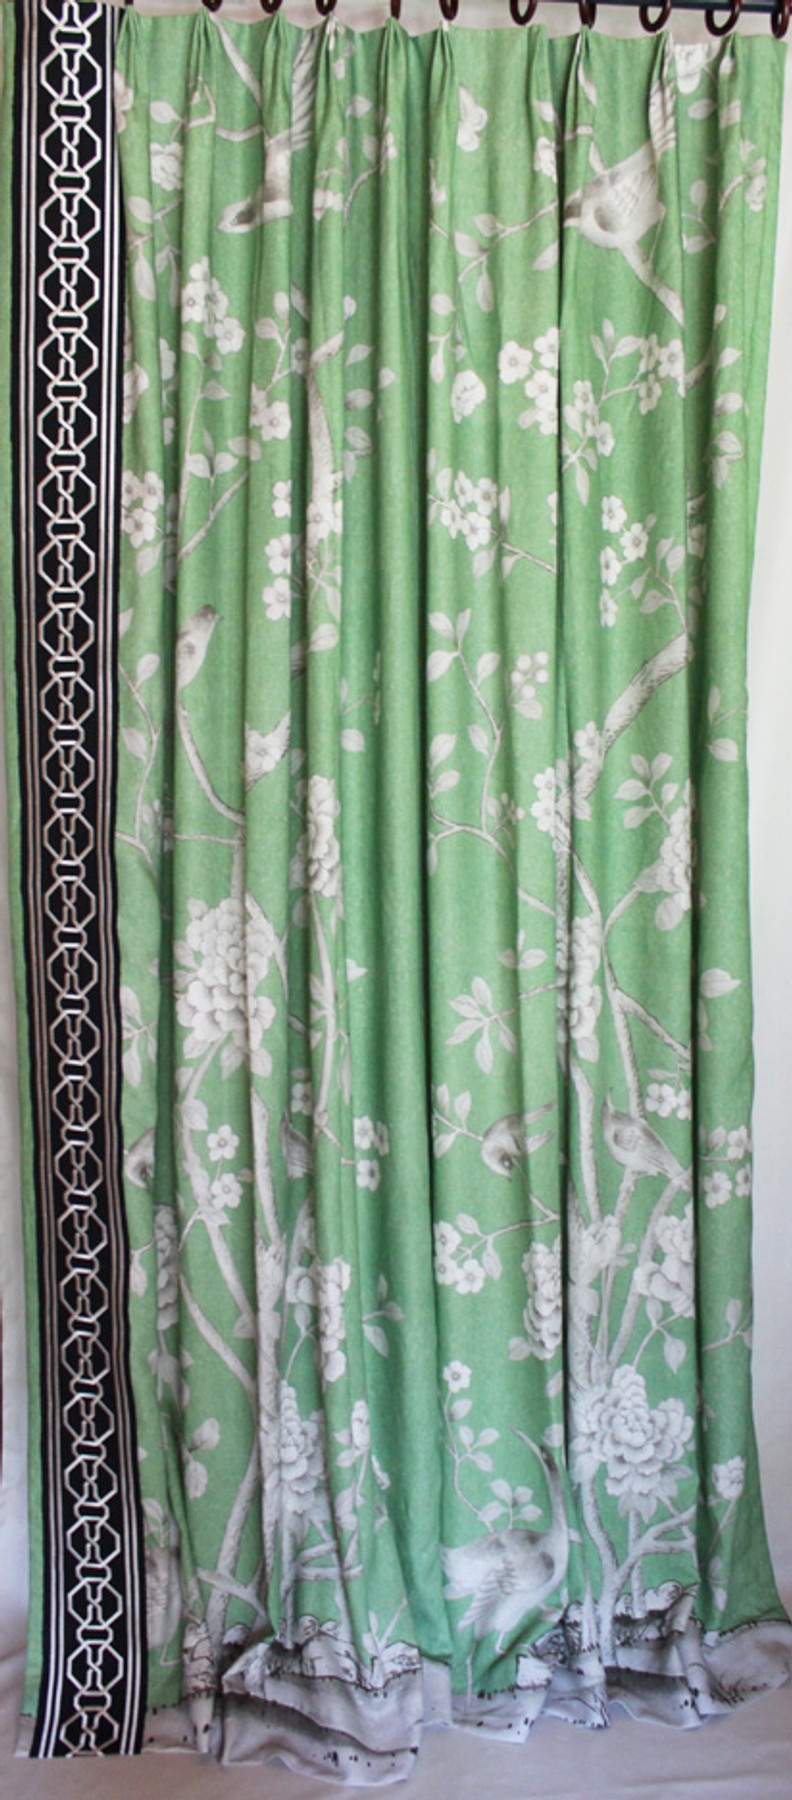 Custom Fan Pleated Drapes by Lynn Chalk in Mary McDonald Chinois Palais in Lettuce with Malmaison Trim in Noir/Swan